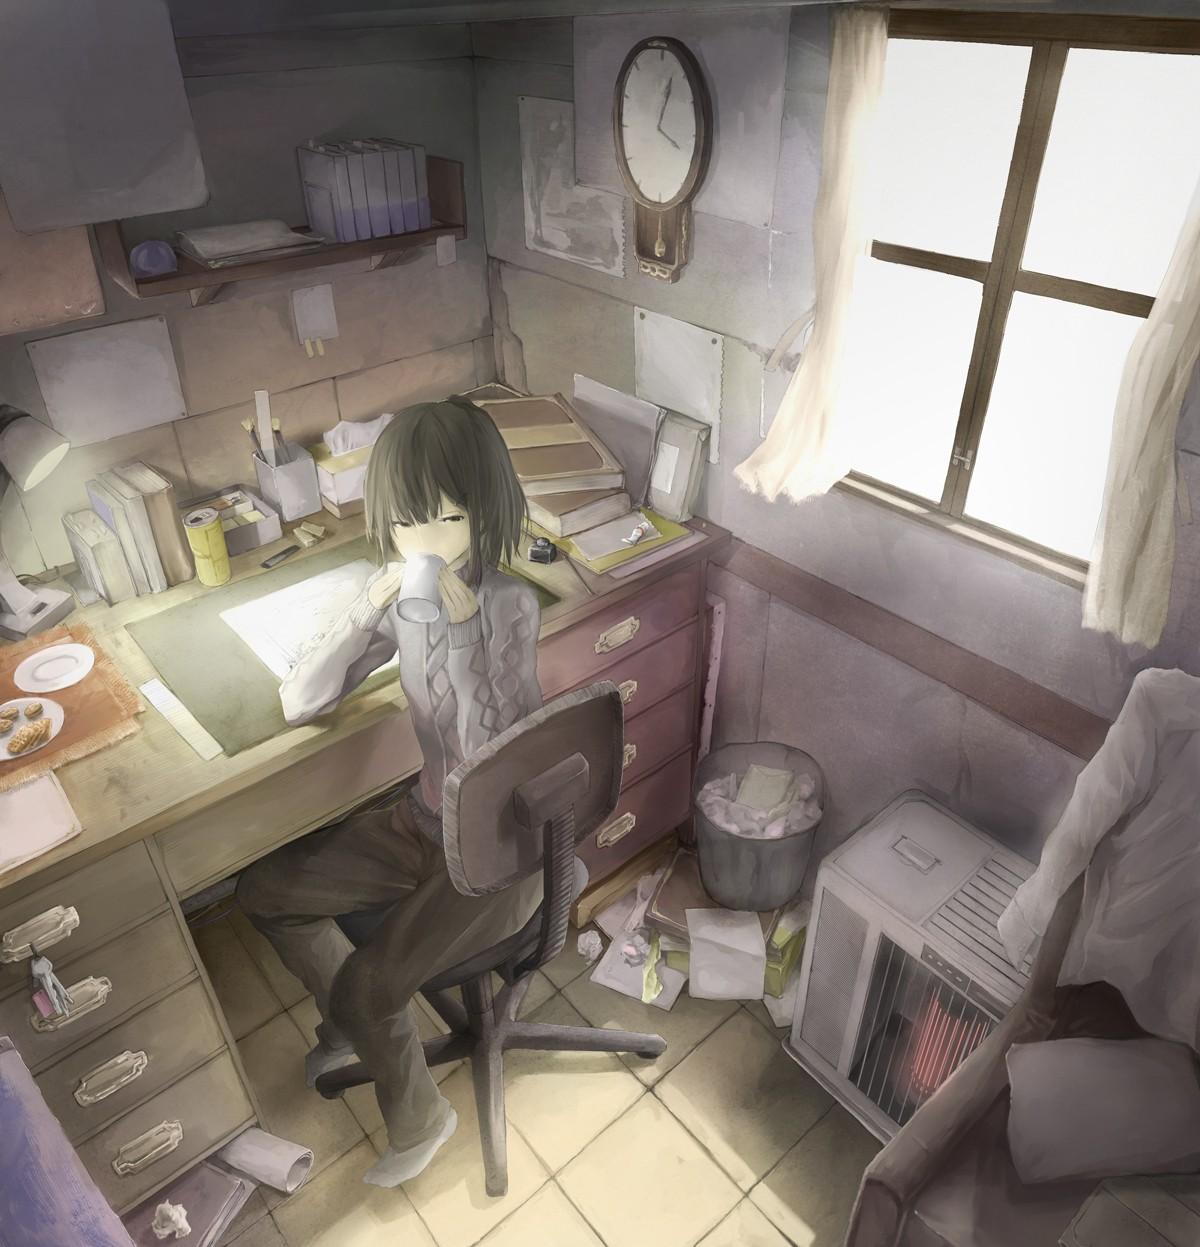 Wallpaper : Japan, Window, Anime Girls, Vehicle, Computer